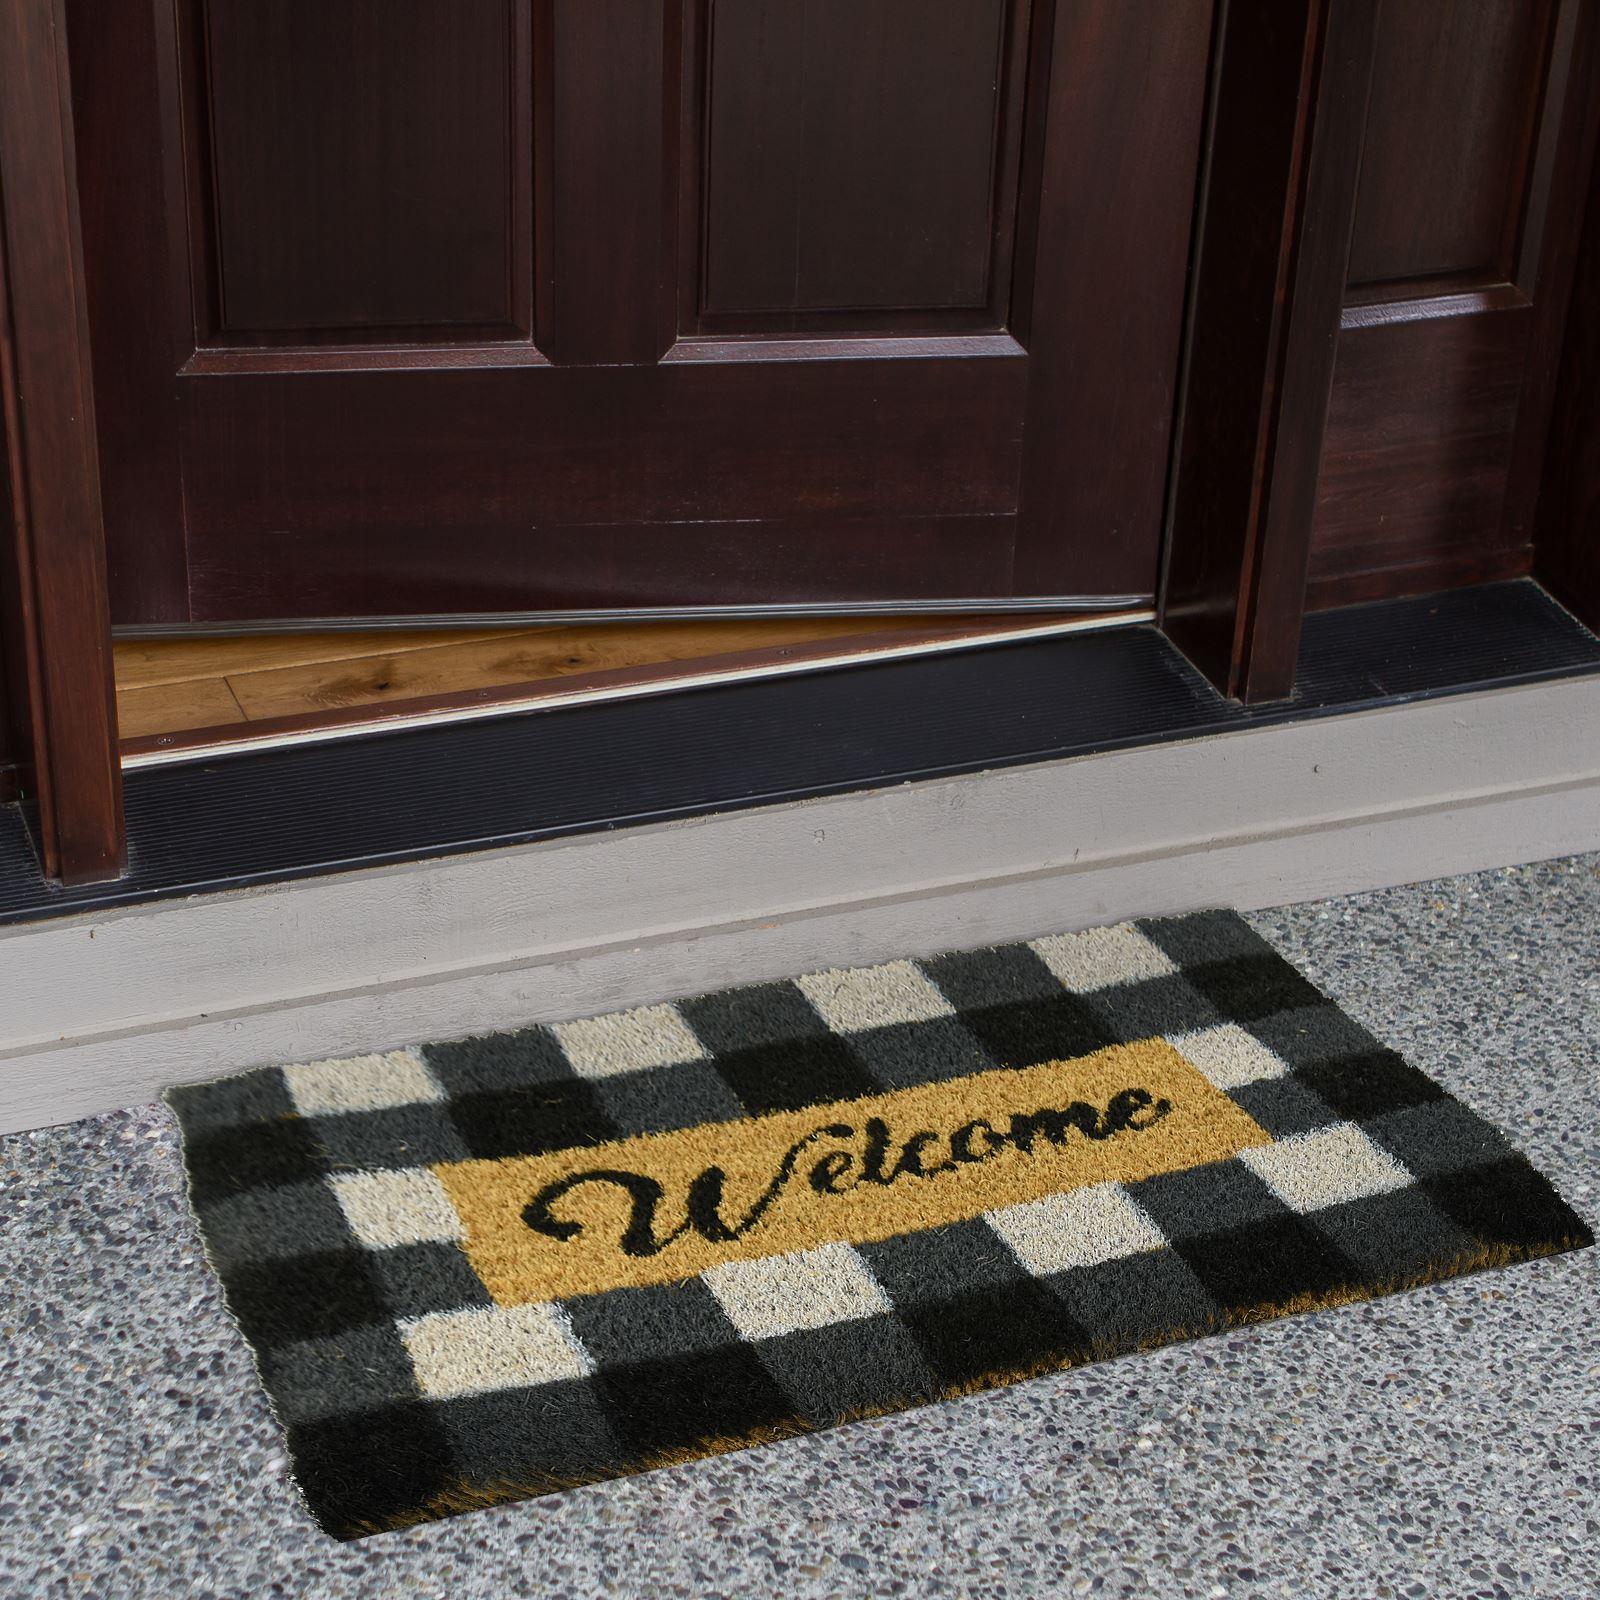 Plain-Non-Slip-Door-Mat-Tough-Natural-Coir-PVC-Back-Welcome-Doormat-40-x-60cm miniatura 14